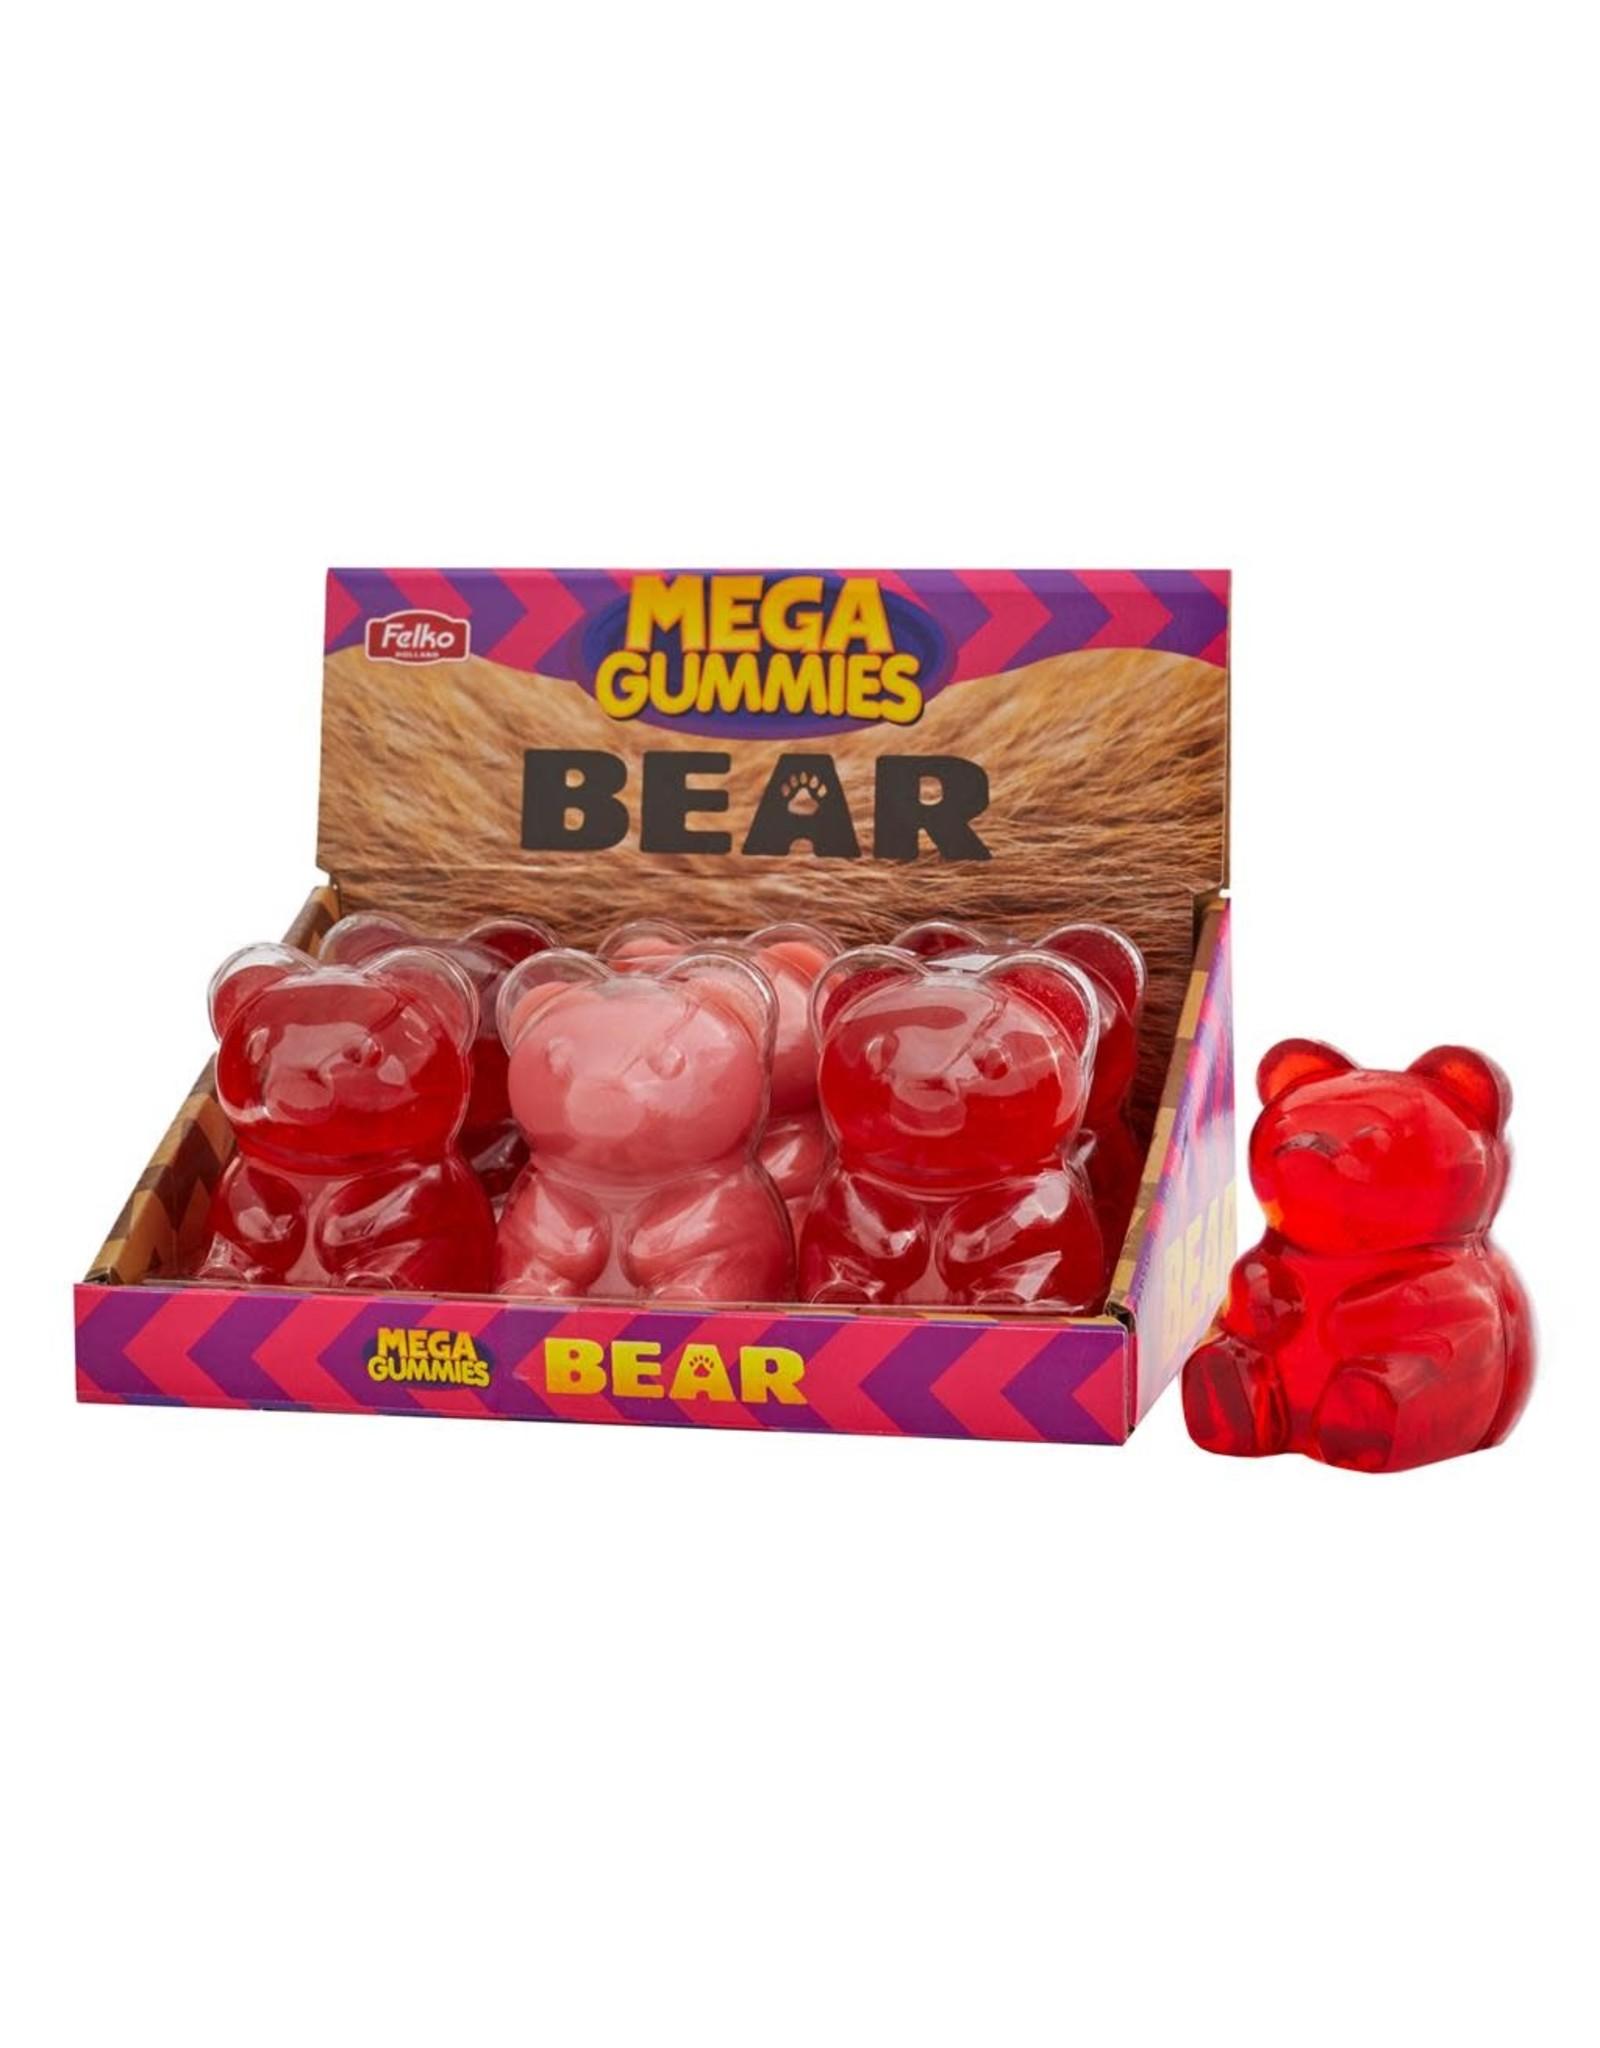 Mega Gummies - Jelly bear - 350g